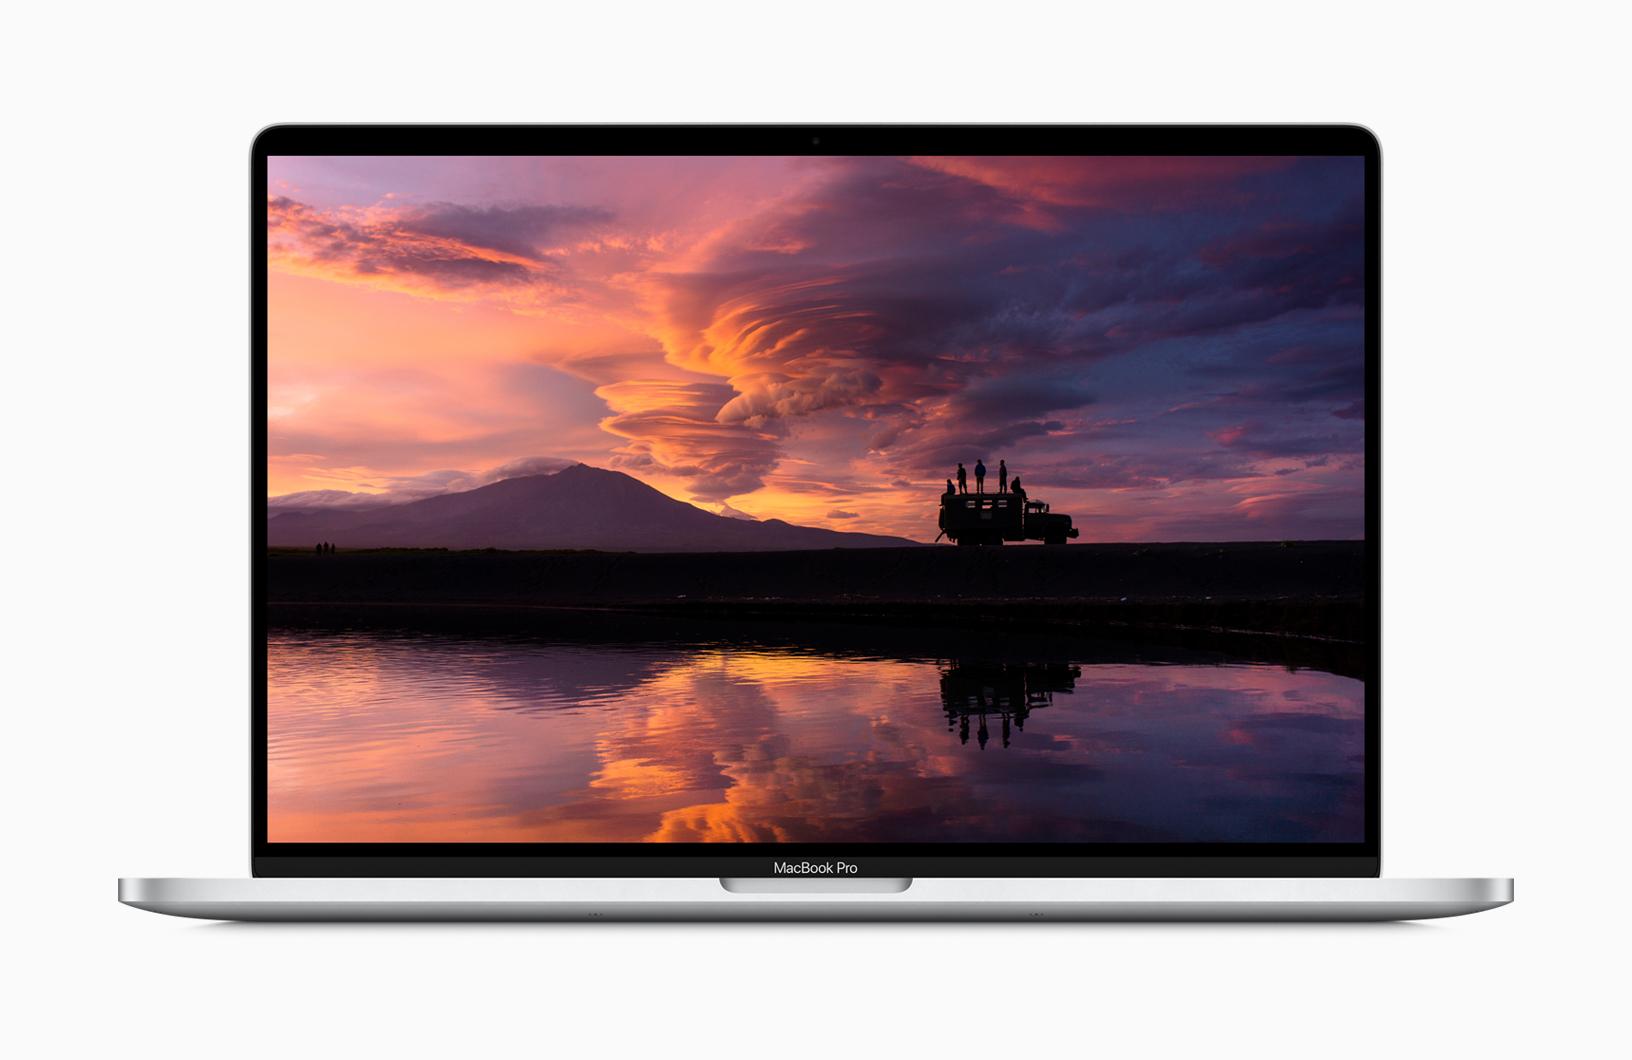 "2019 Apple MacBook Pro 16"" Silver MVVM2HB/A 16"" 2.3Ghz i9 8C 9th Gen"